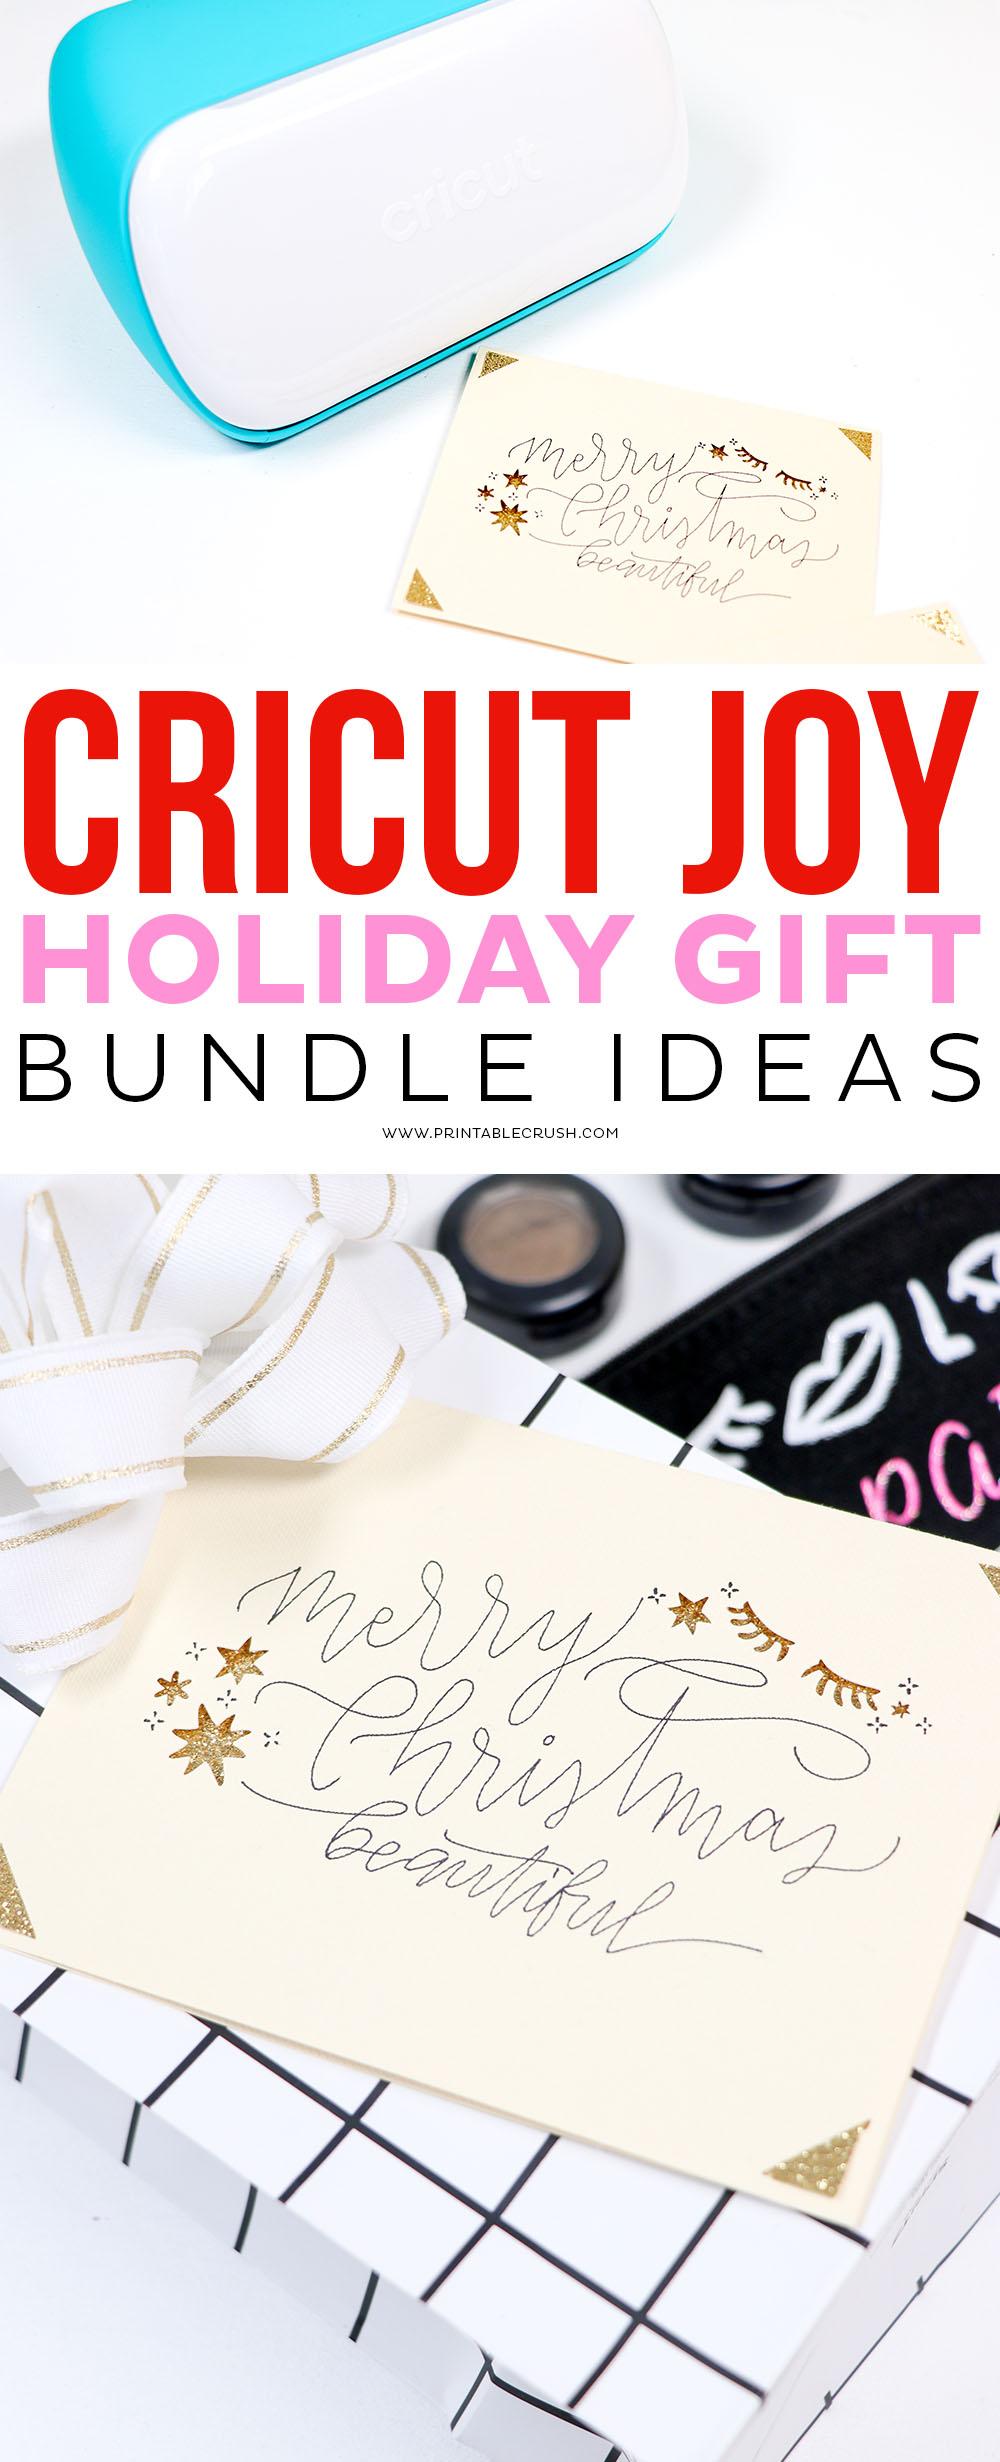 Holiday Cricut Gifts - Gift Guide - Cricut Joy Gift Guide - Printable Crush